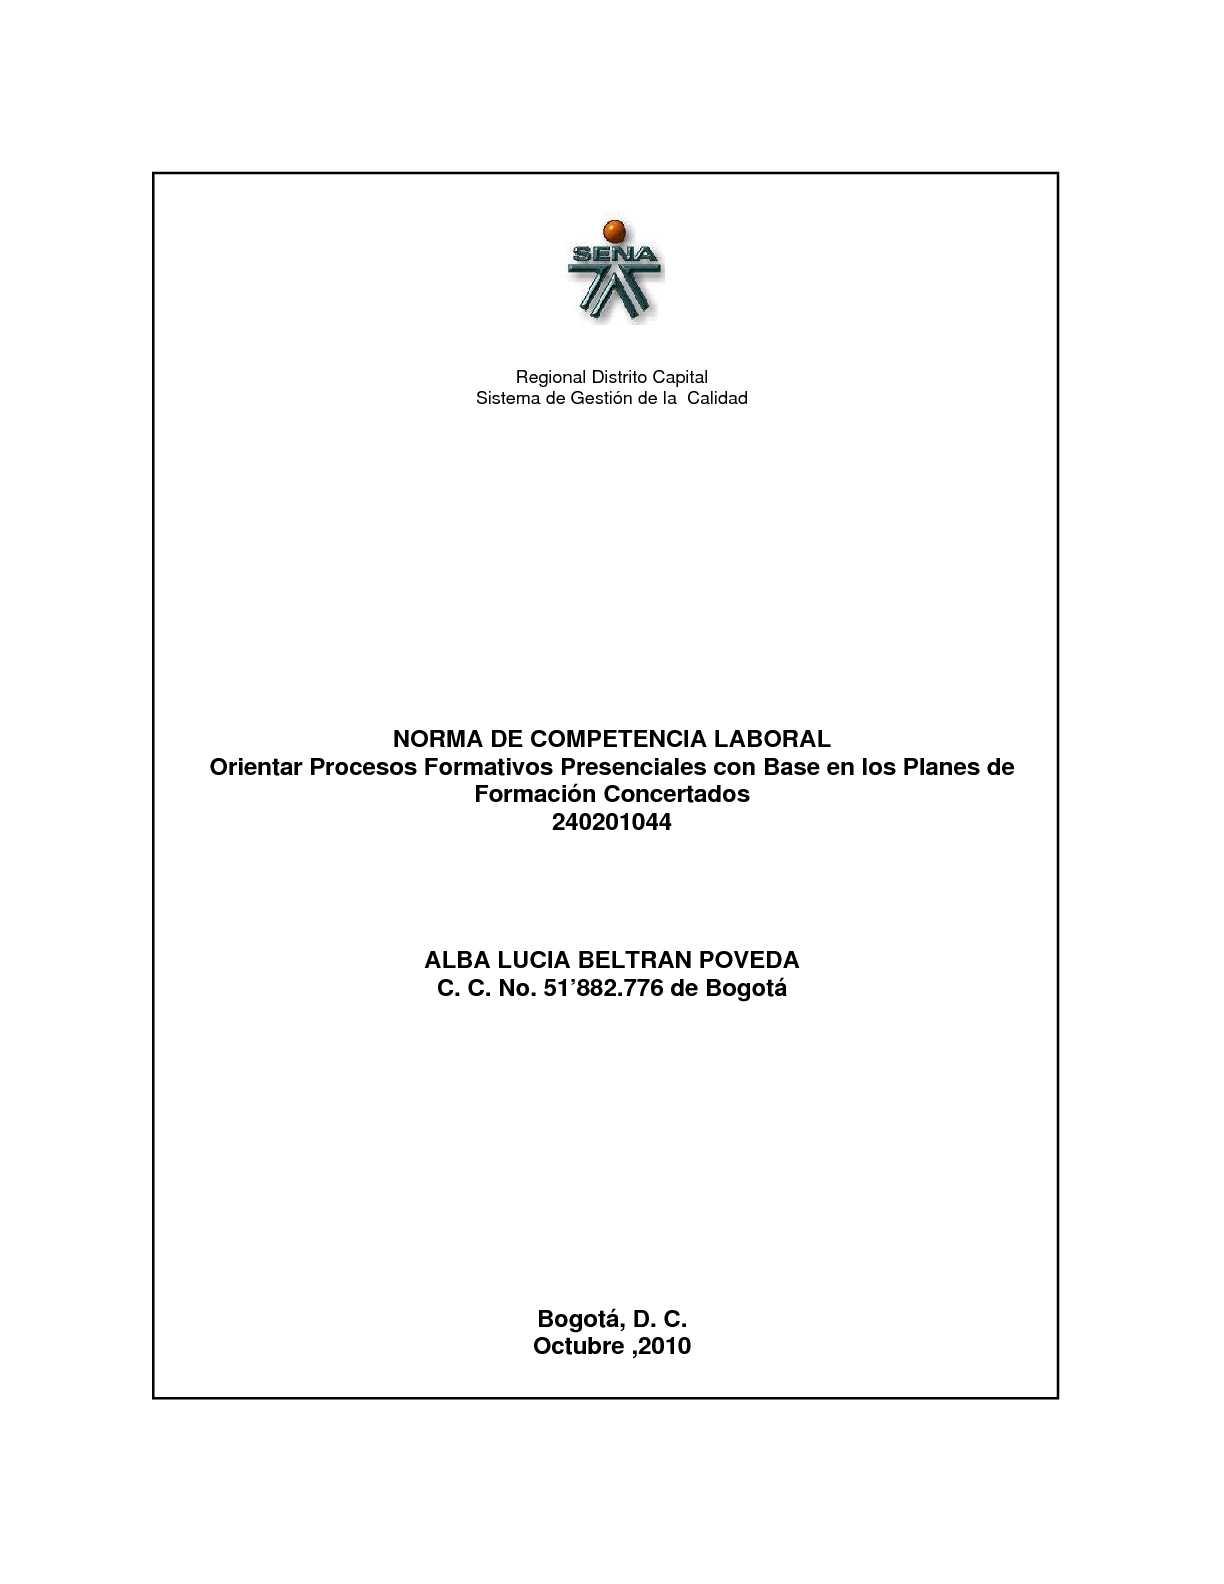 NORMA DE COMPETENCIA PEDAGOGICA